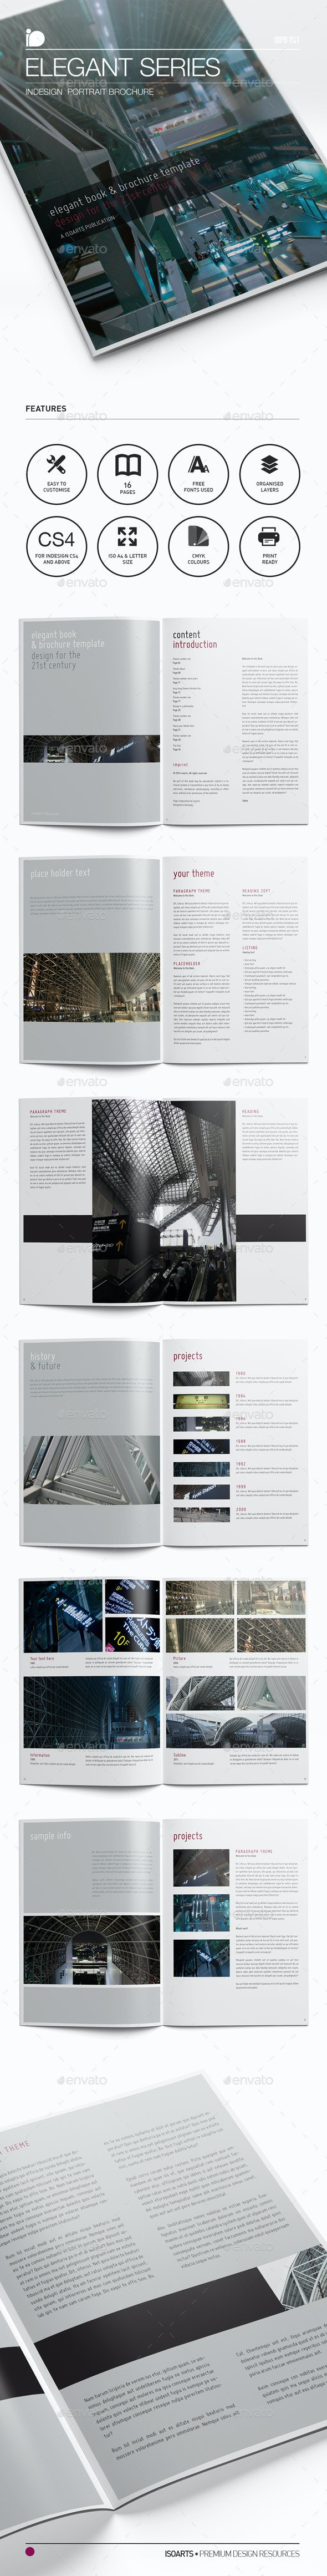 Portrait Brochure • Elegant Series - Corporate Brochures